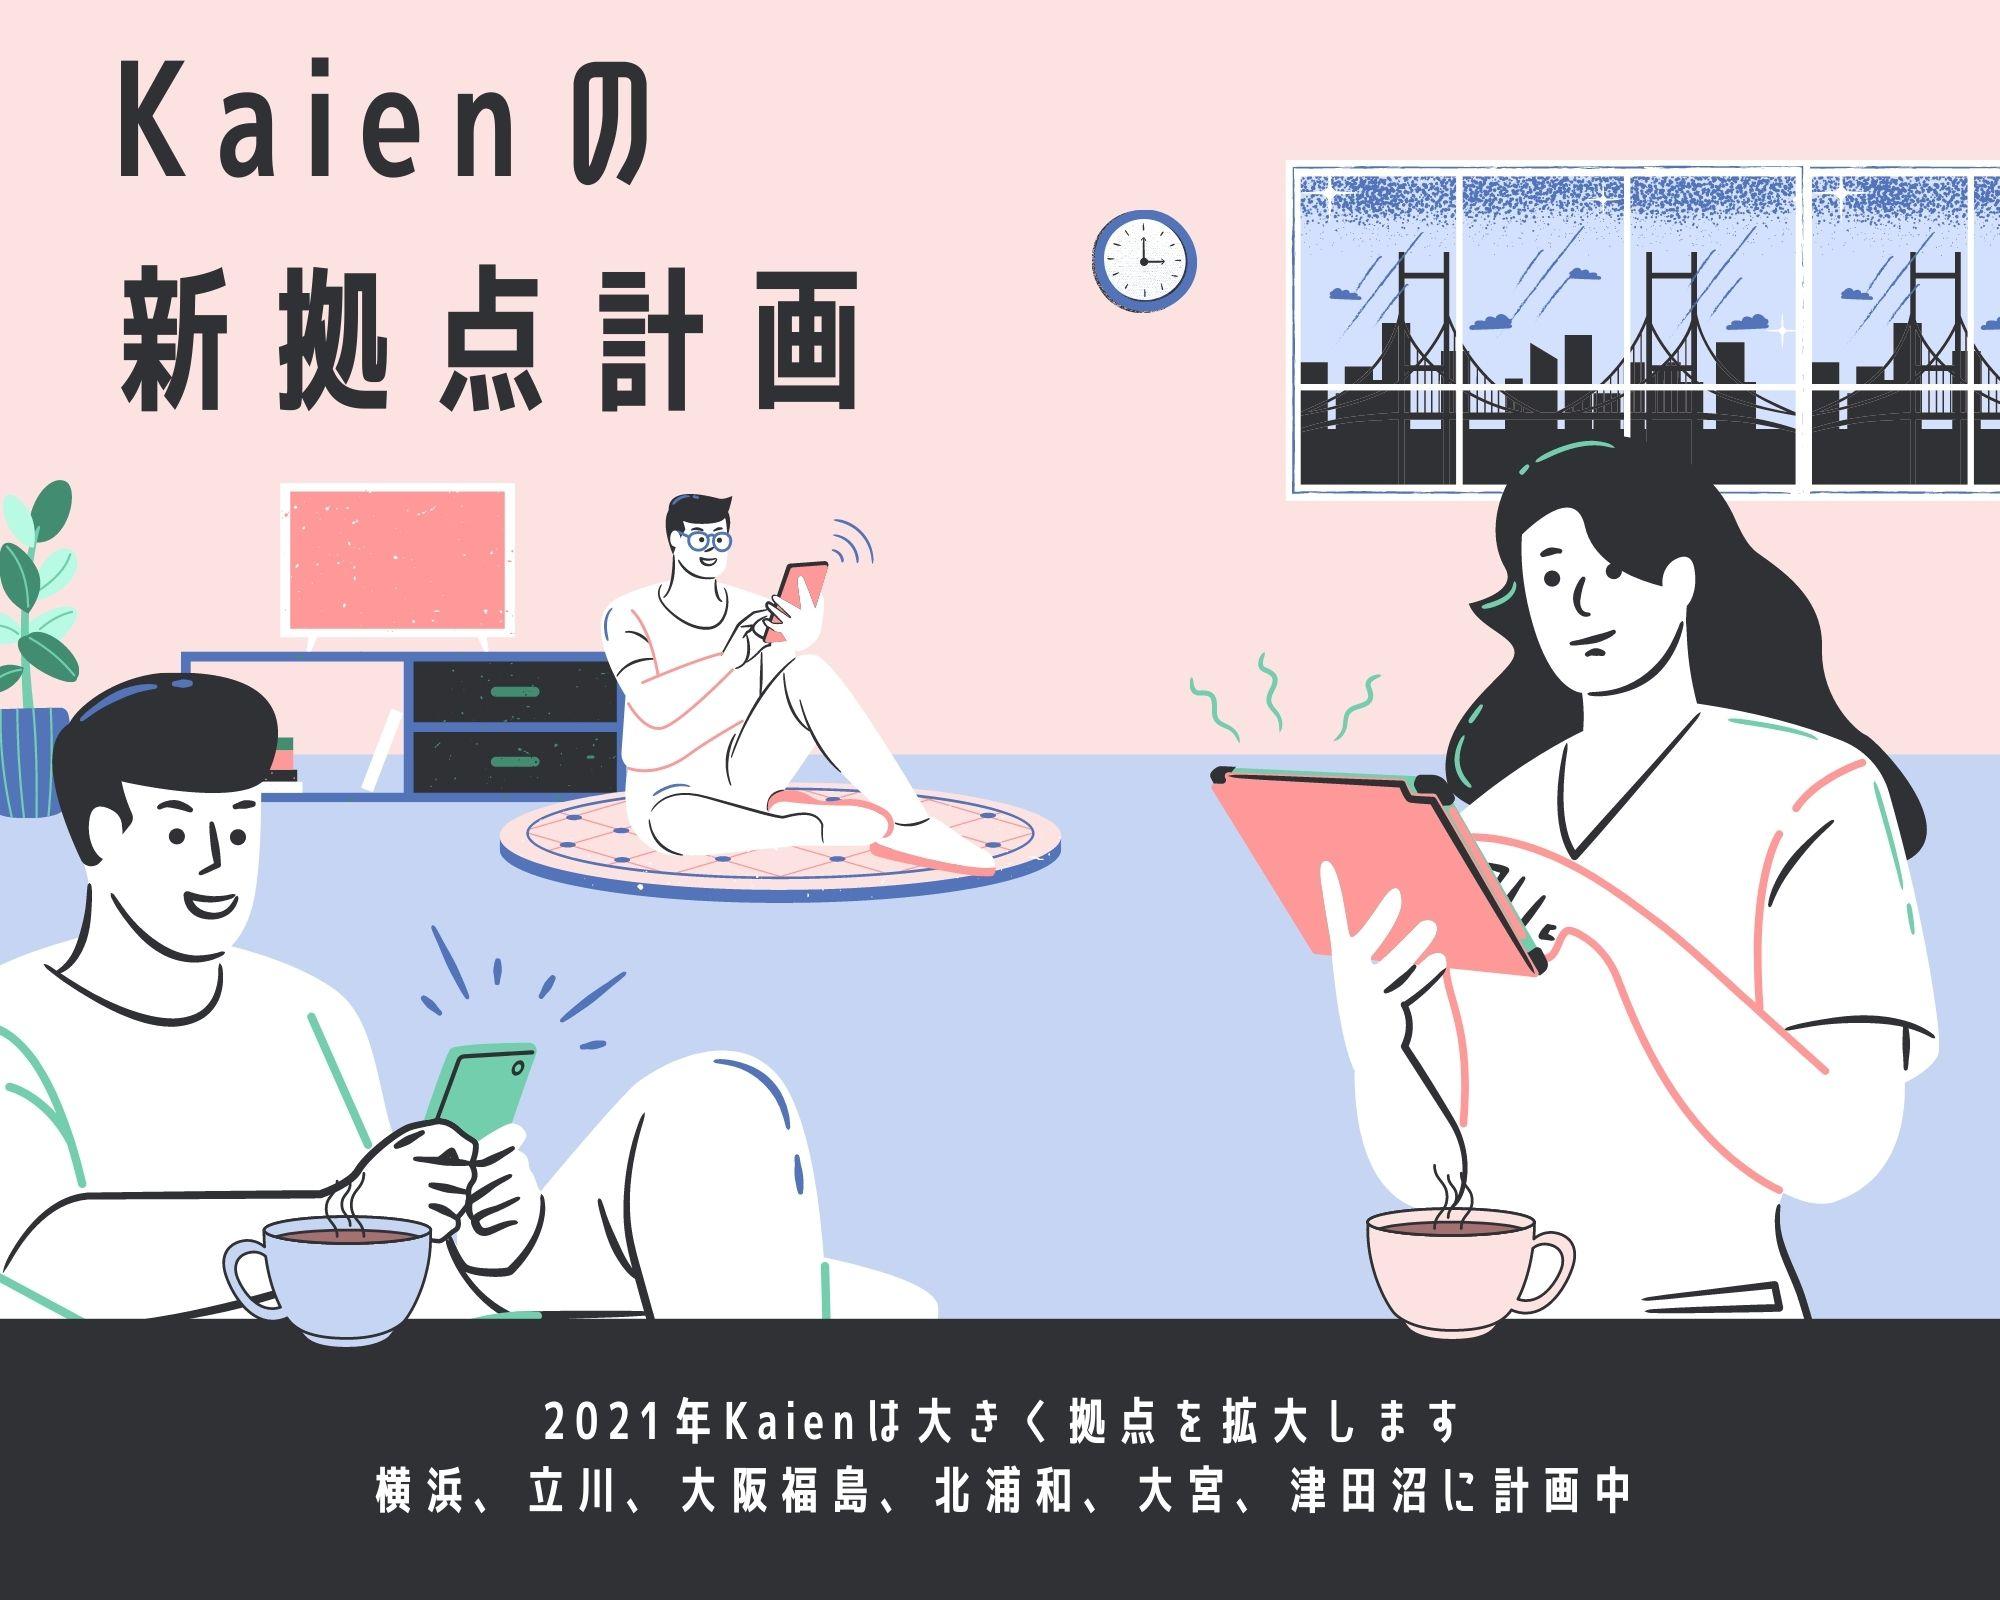 Kaien新拠点計画。横浜第2第3、立川第2、大阪福島、北浦和、大宮、津田沼に立ち上げ予定。